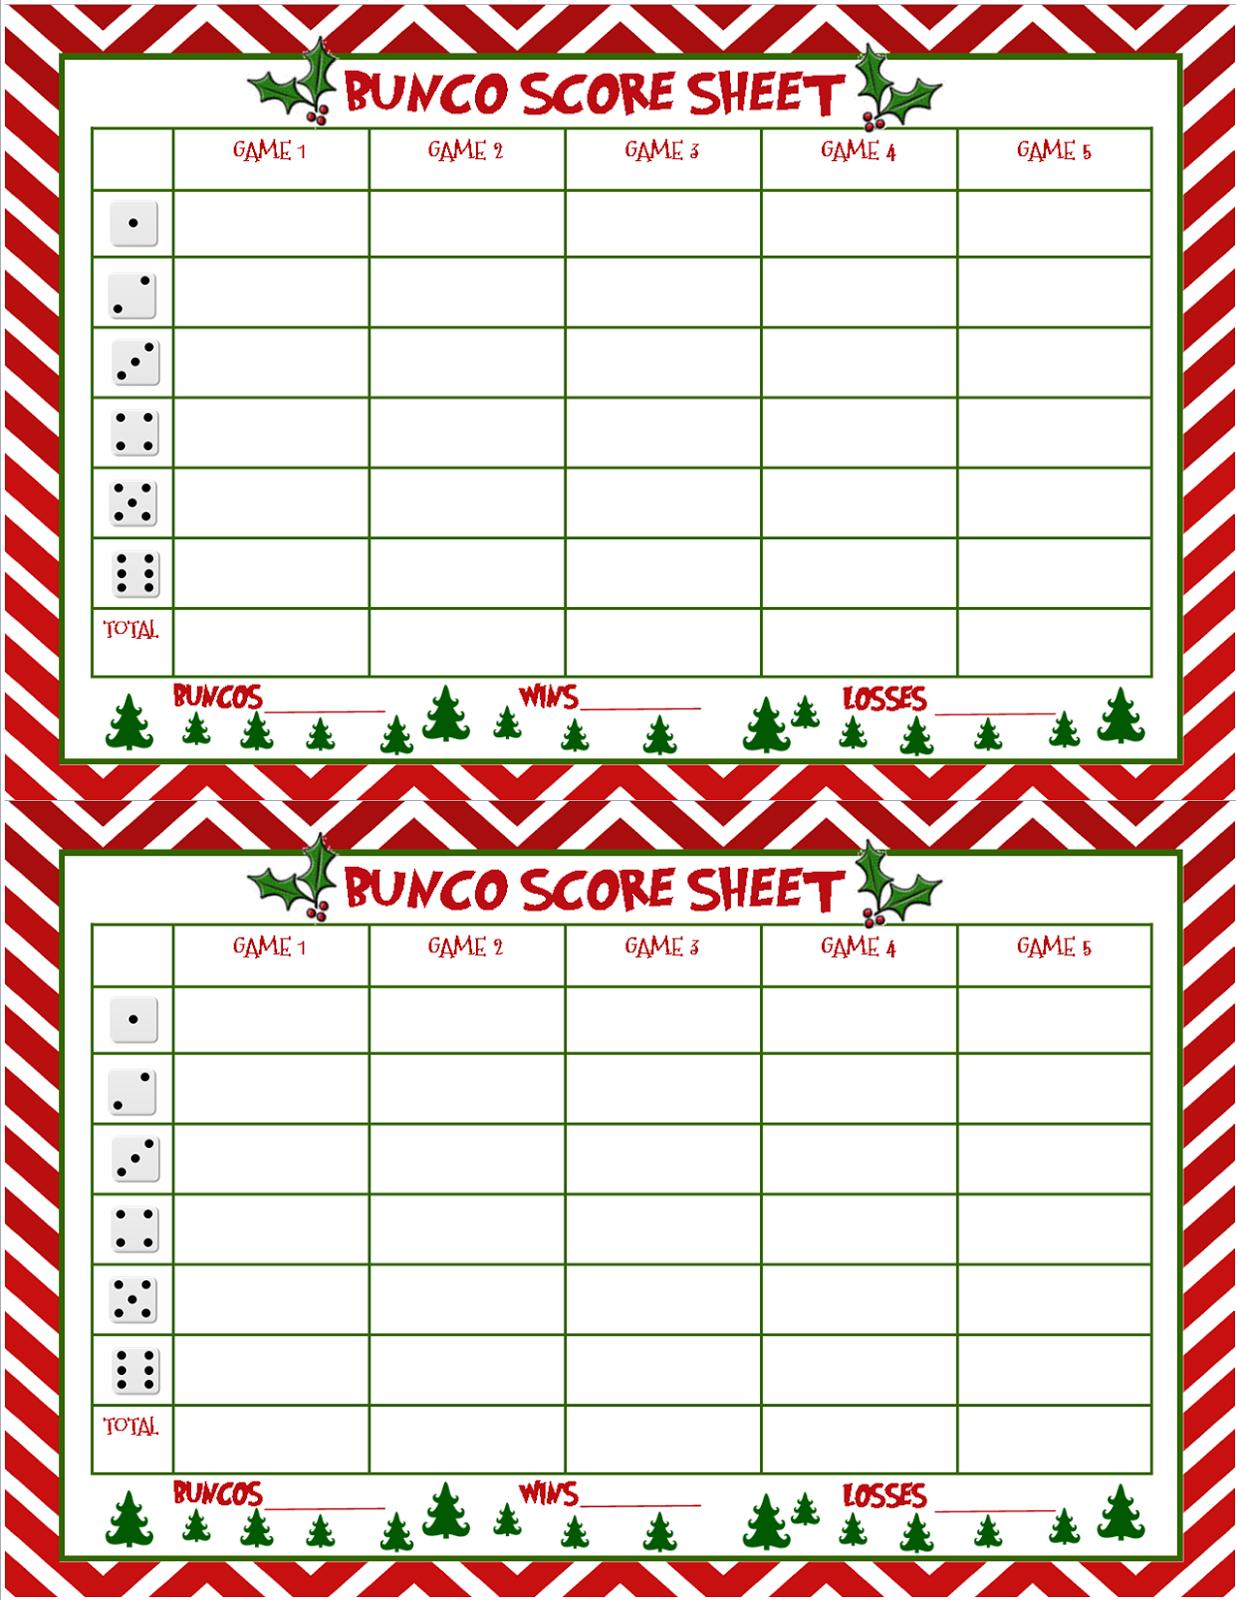 Christmas Bunco Score Sheets Free   Bunco   Bunco Score Sheets - Free Printable Bunco Game Sheets